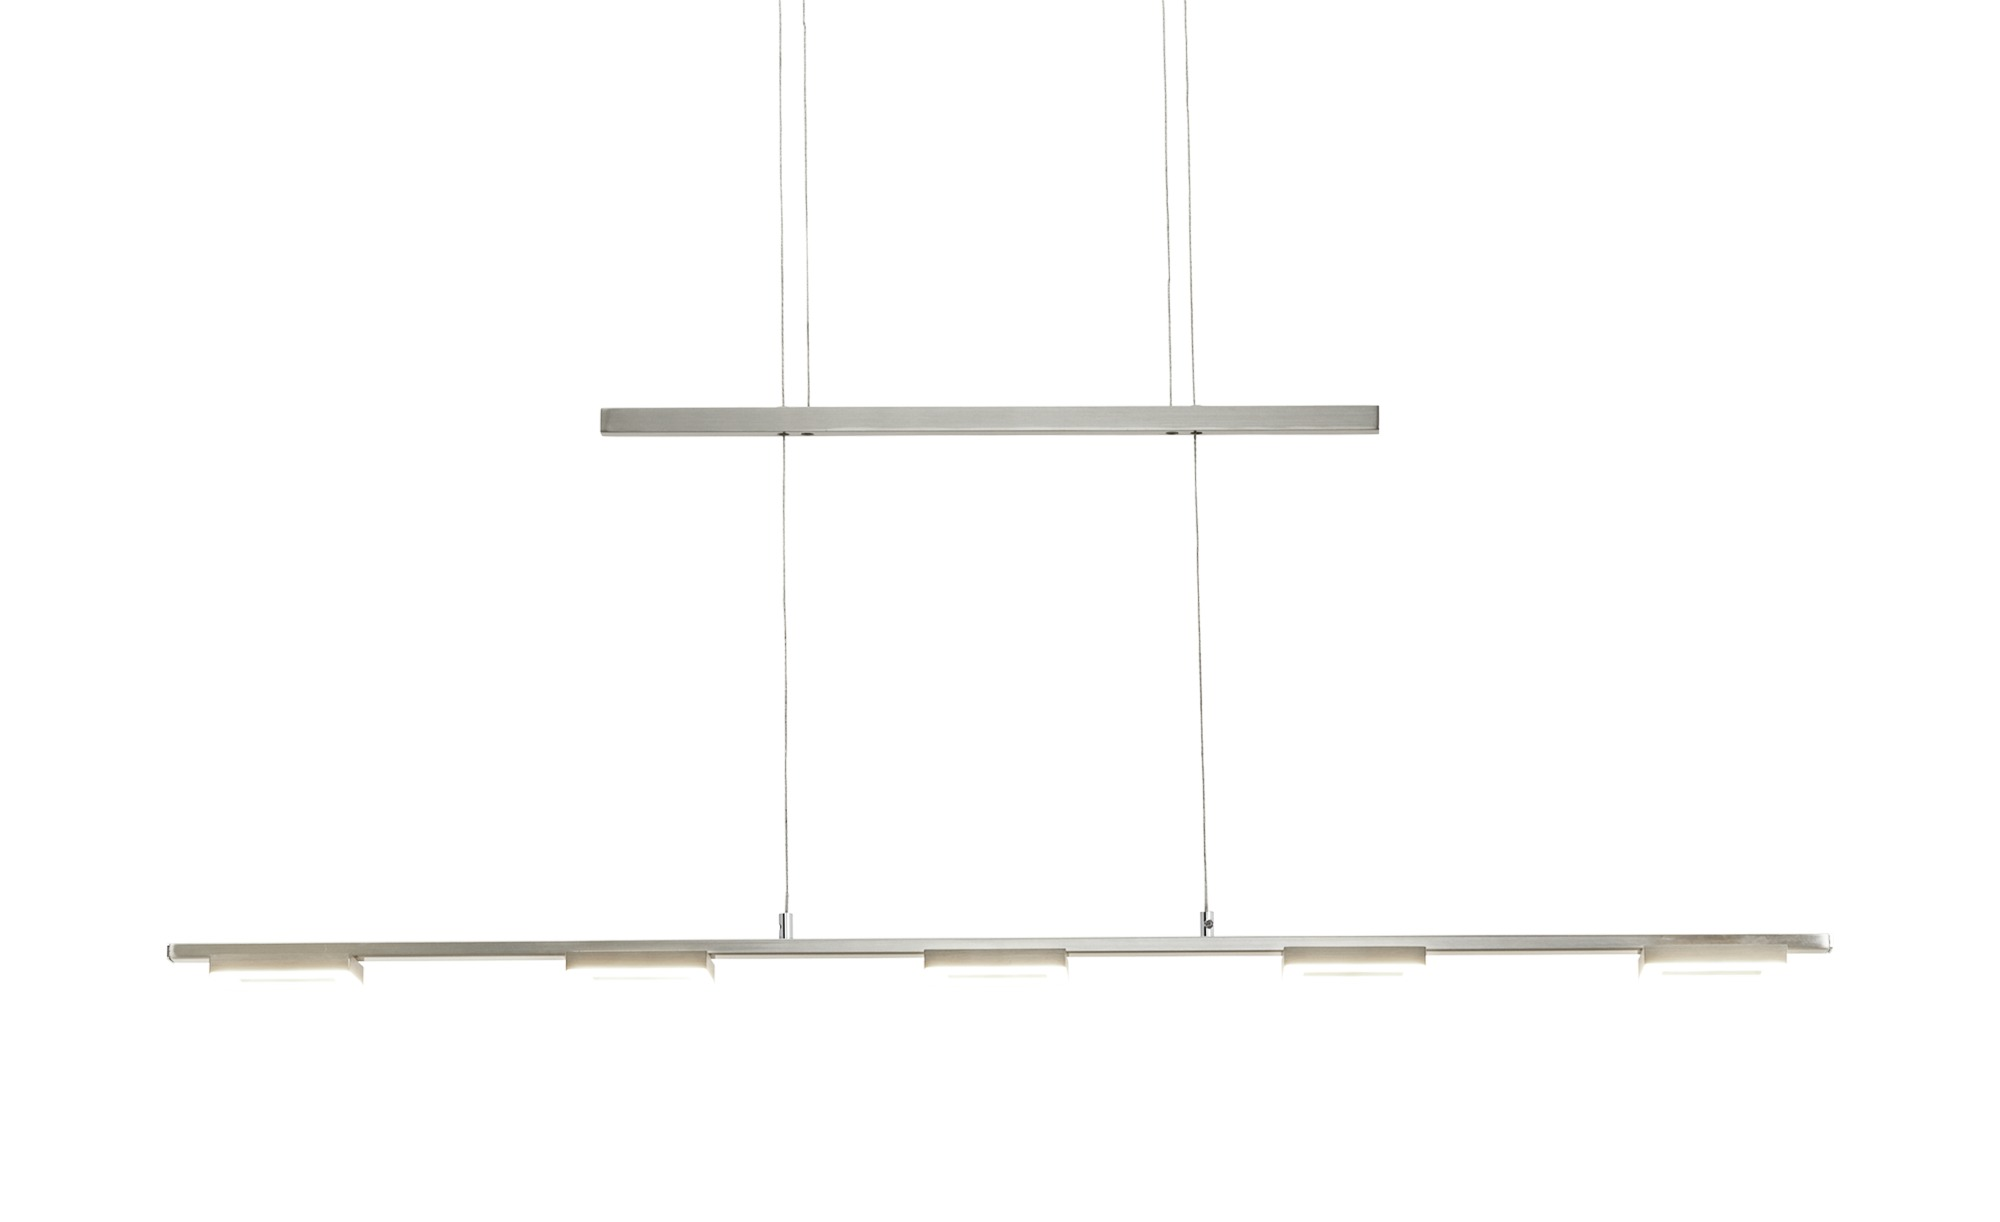 Paul Neuhaus LED-Pendelleuchte 5-flammig ¦ silber Lampen & Leuchten > LED-Leuchten > LED-Pendelleuchten - Höffner